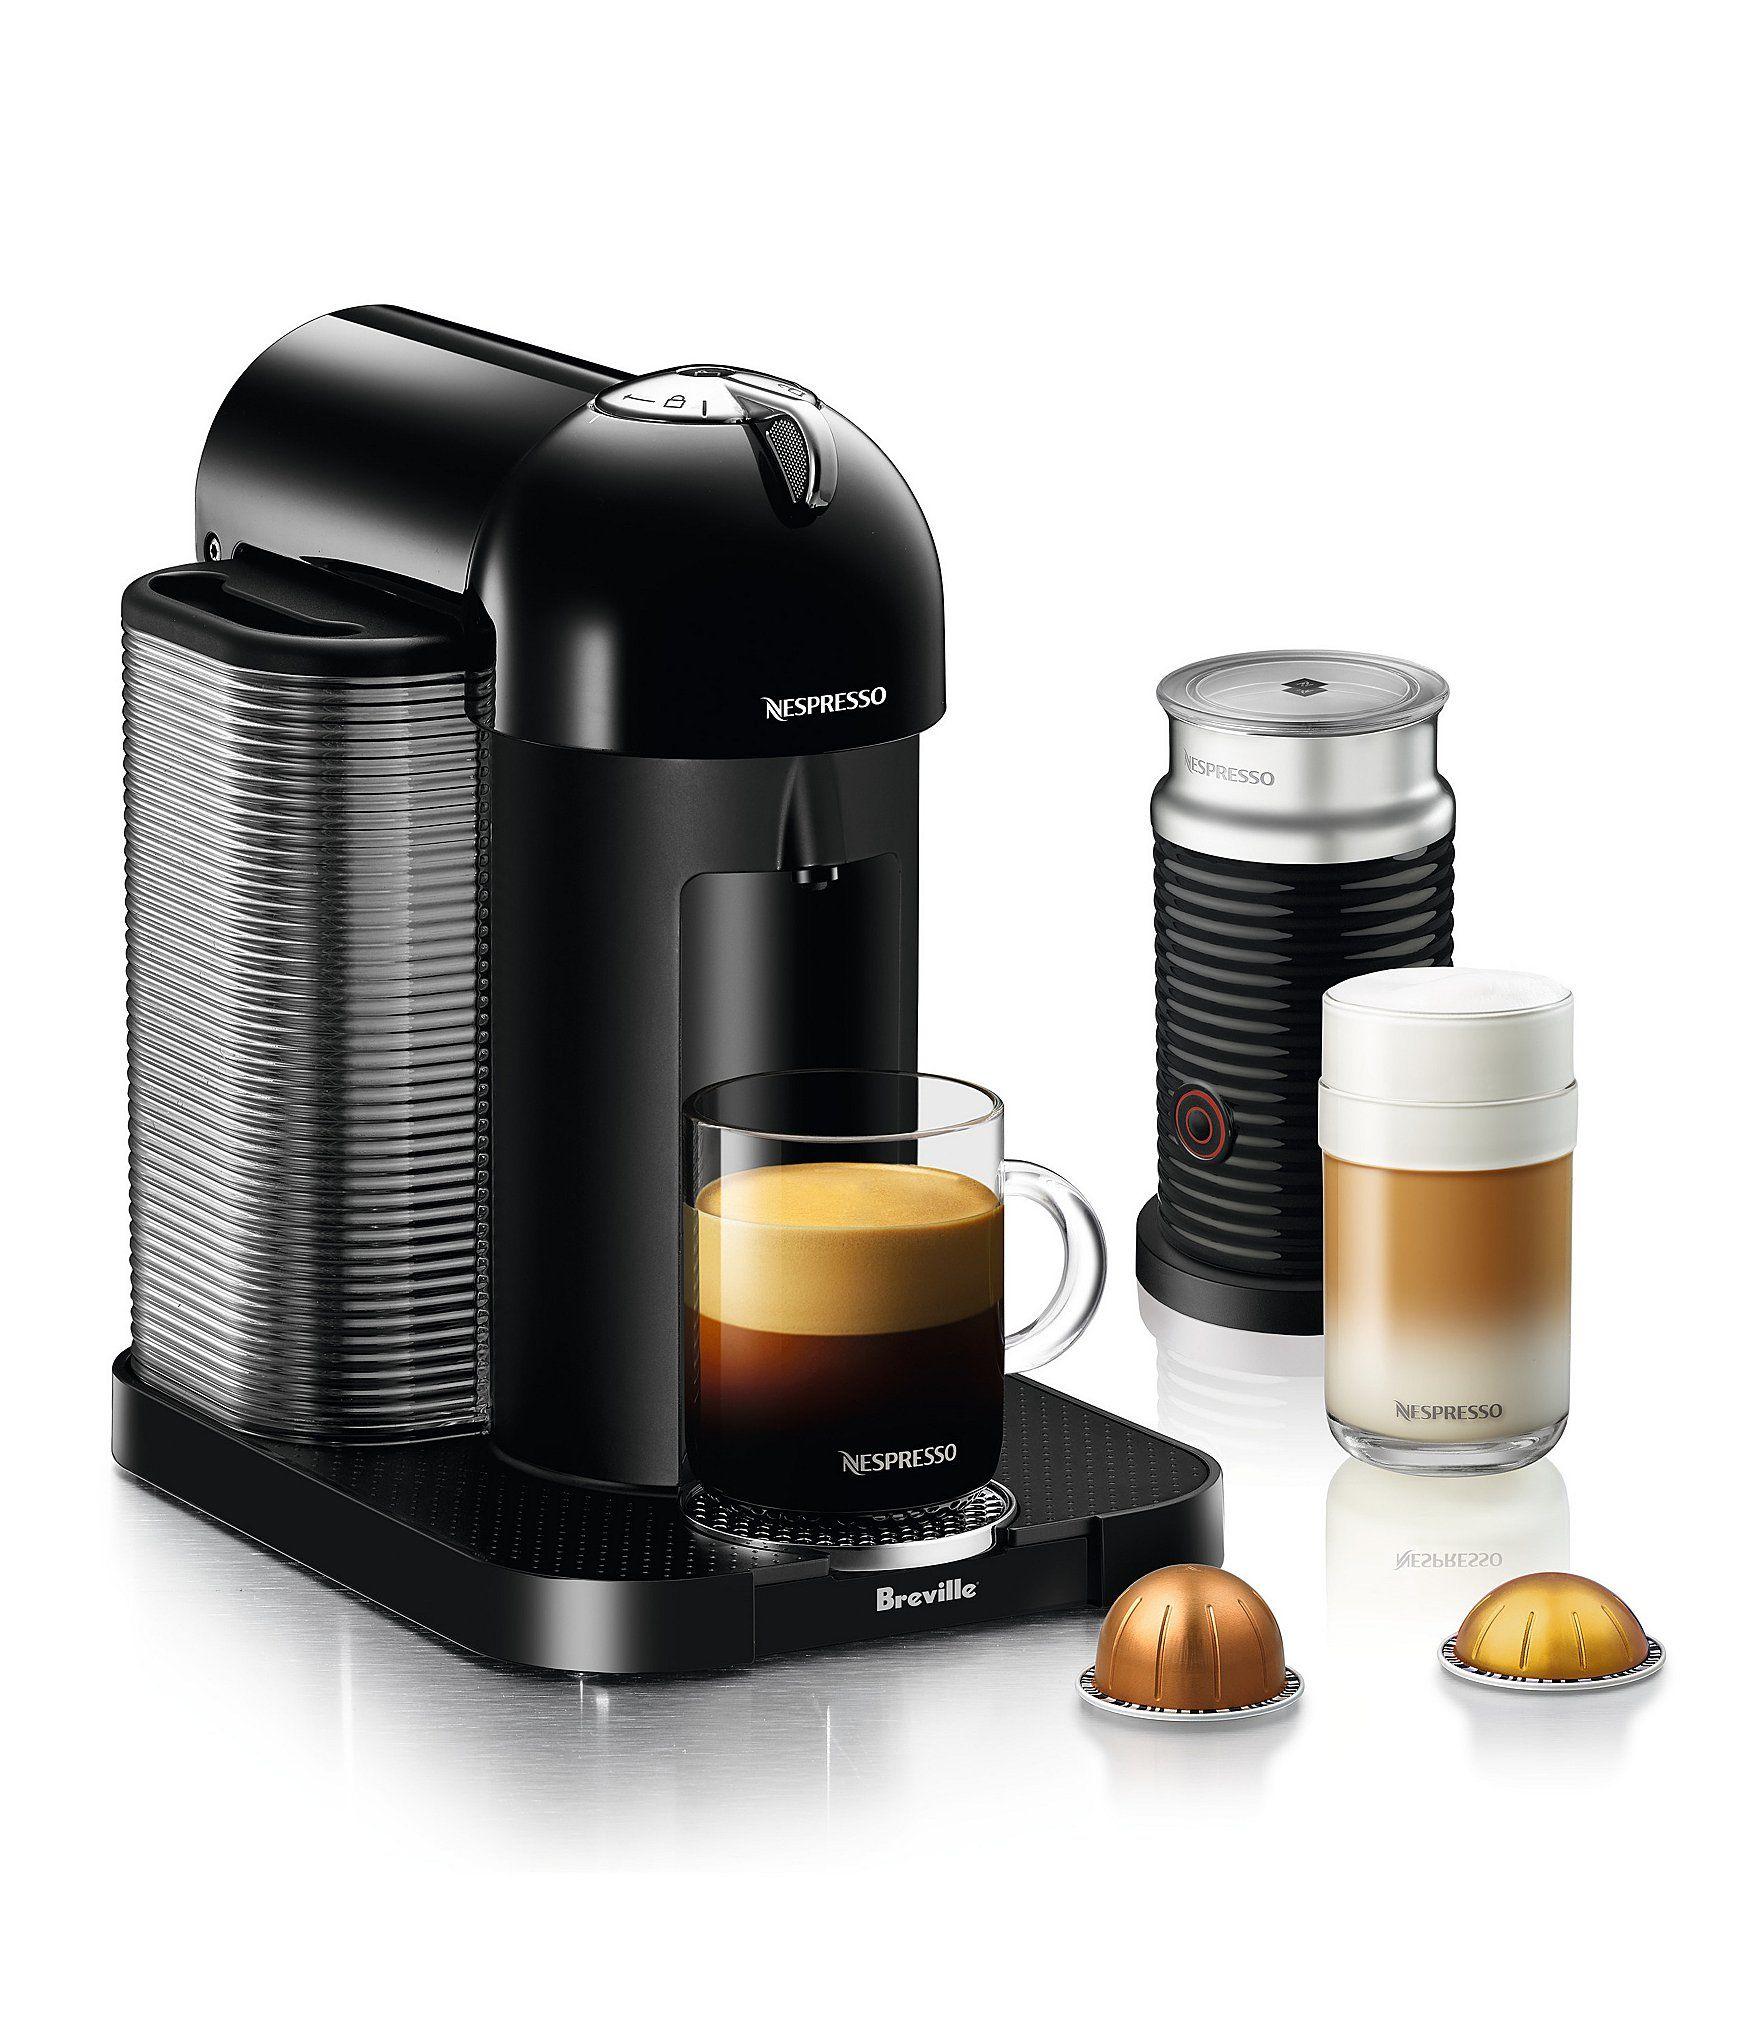 Nespresso Citiz & Milk Espresso Maker Black Capsule